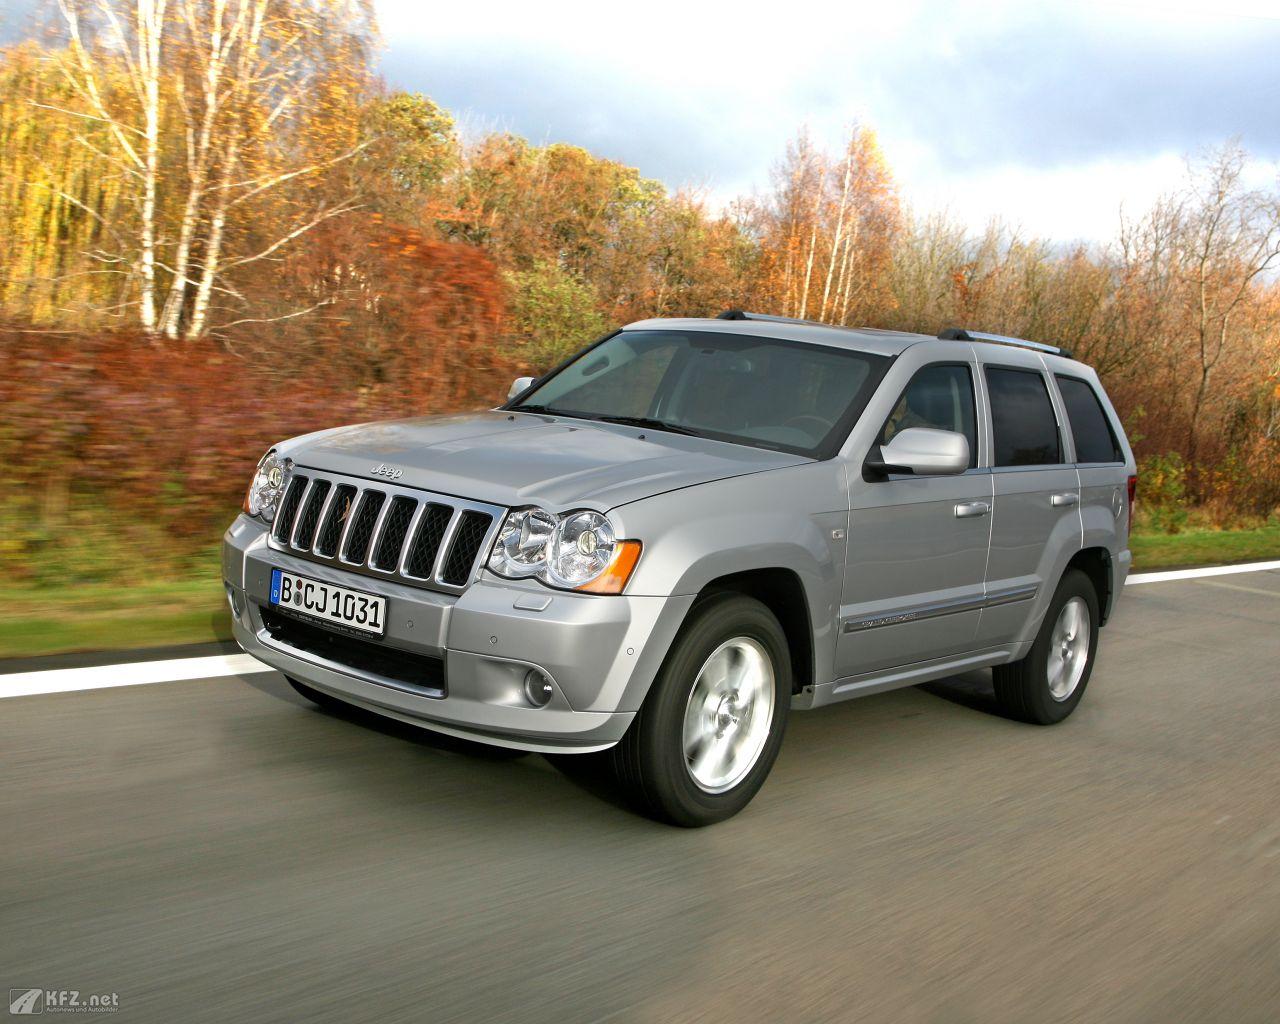 jeep-grand-cherokee-1280x1024-6